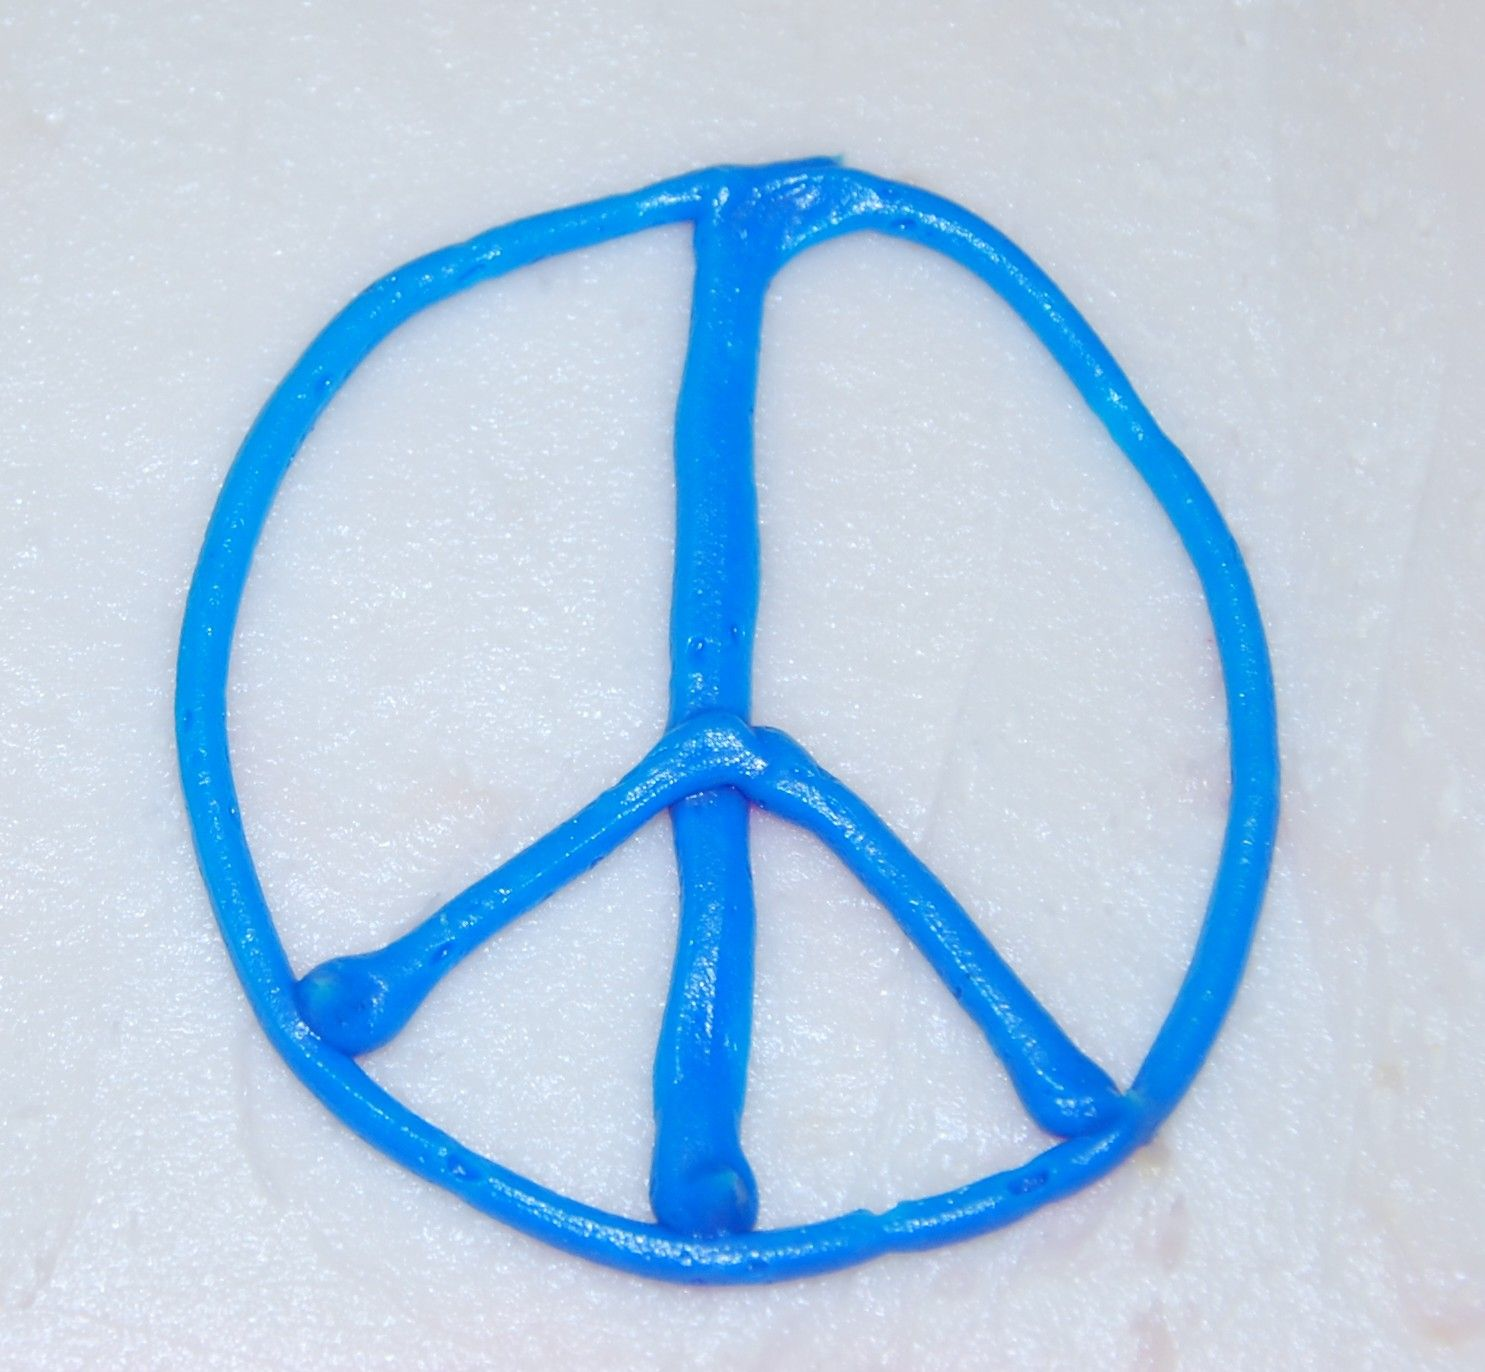 My birthday cake peace sign :)